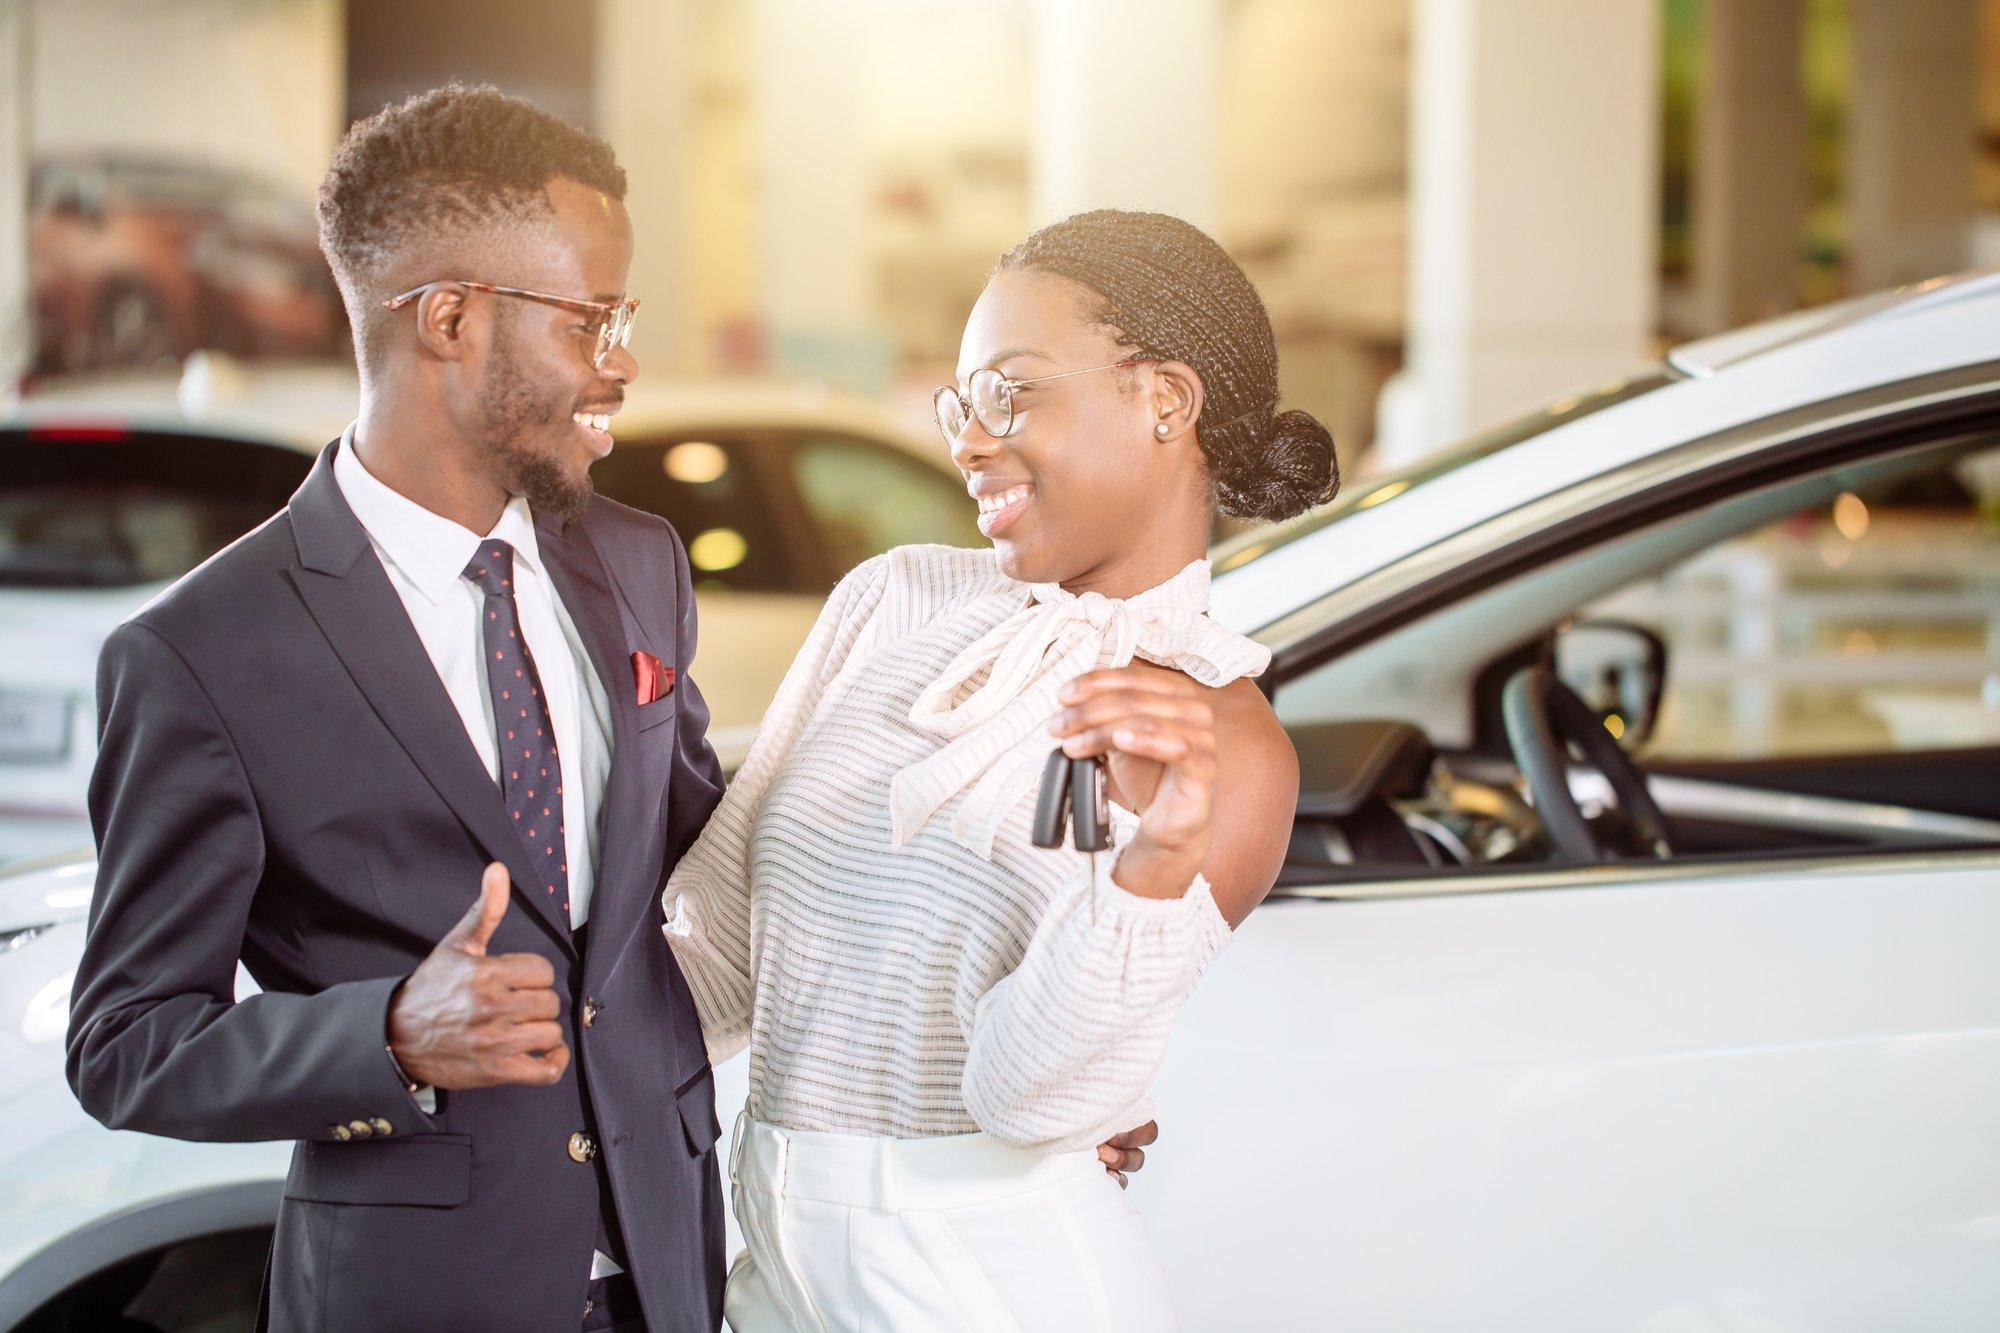 Visiting car dealership. couple holding key of their new car, looking at camera